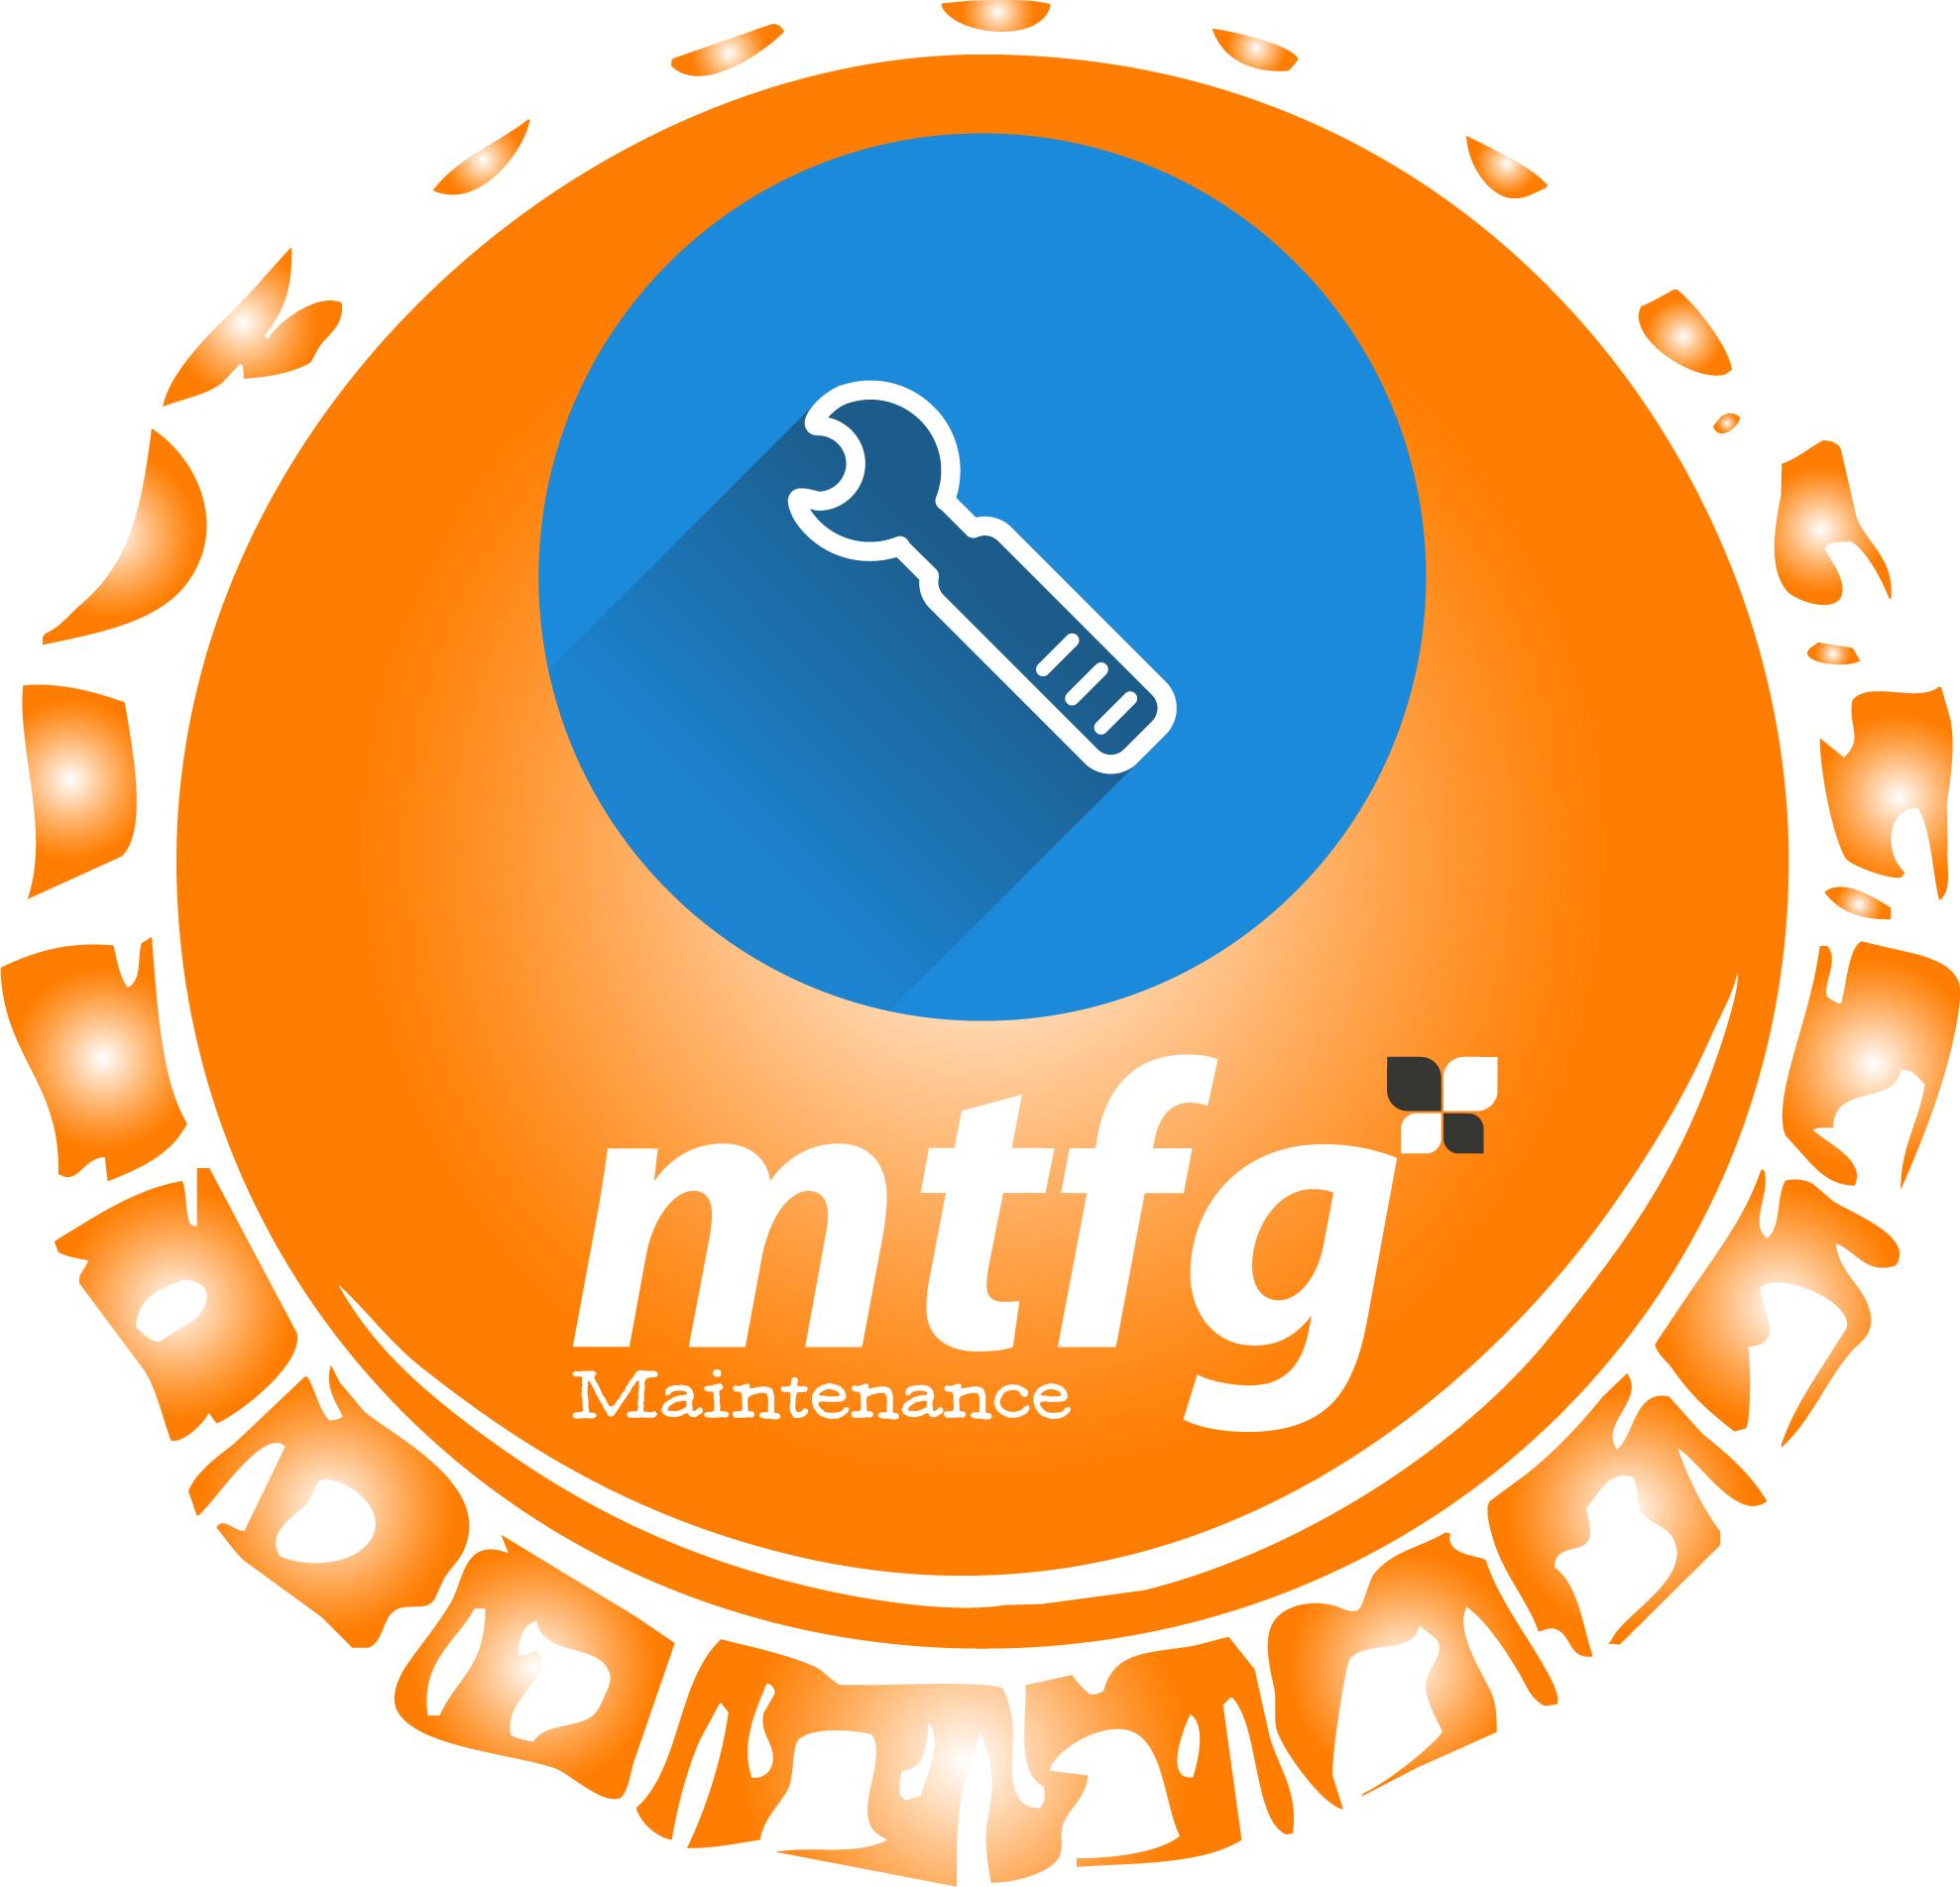 MTFG Maintenance